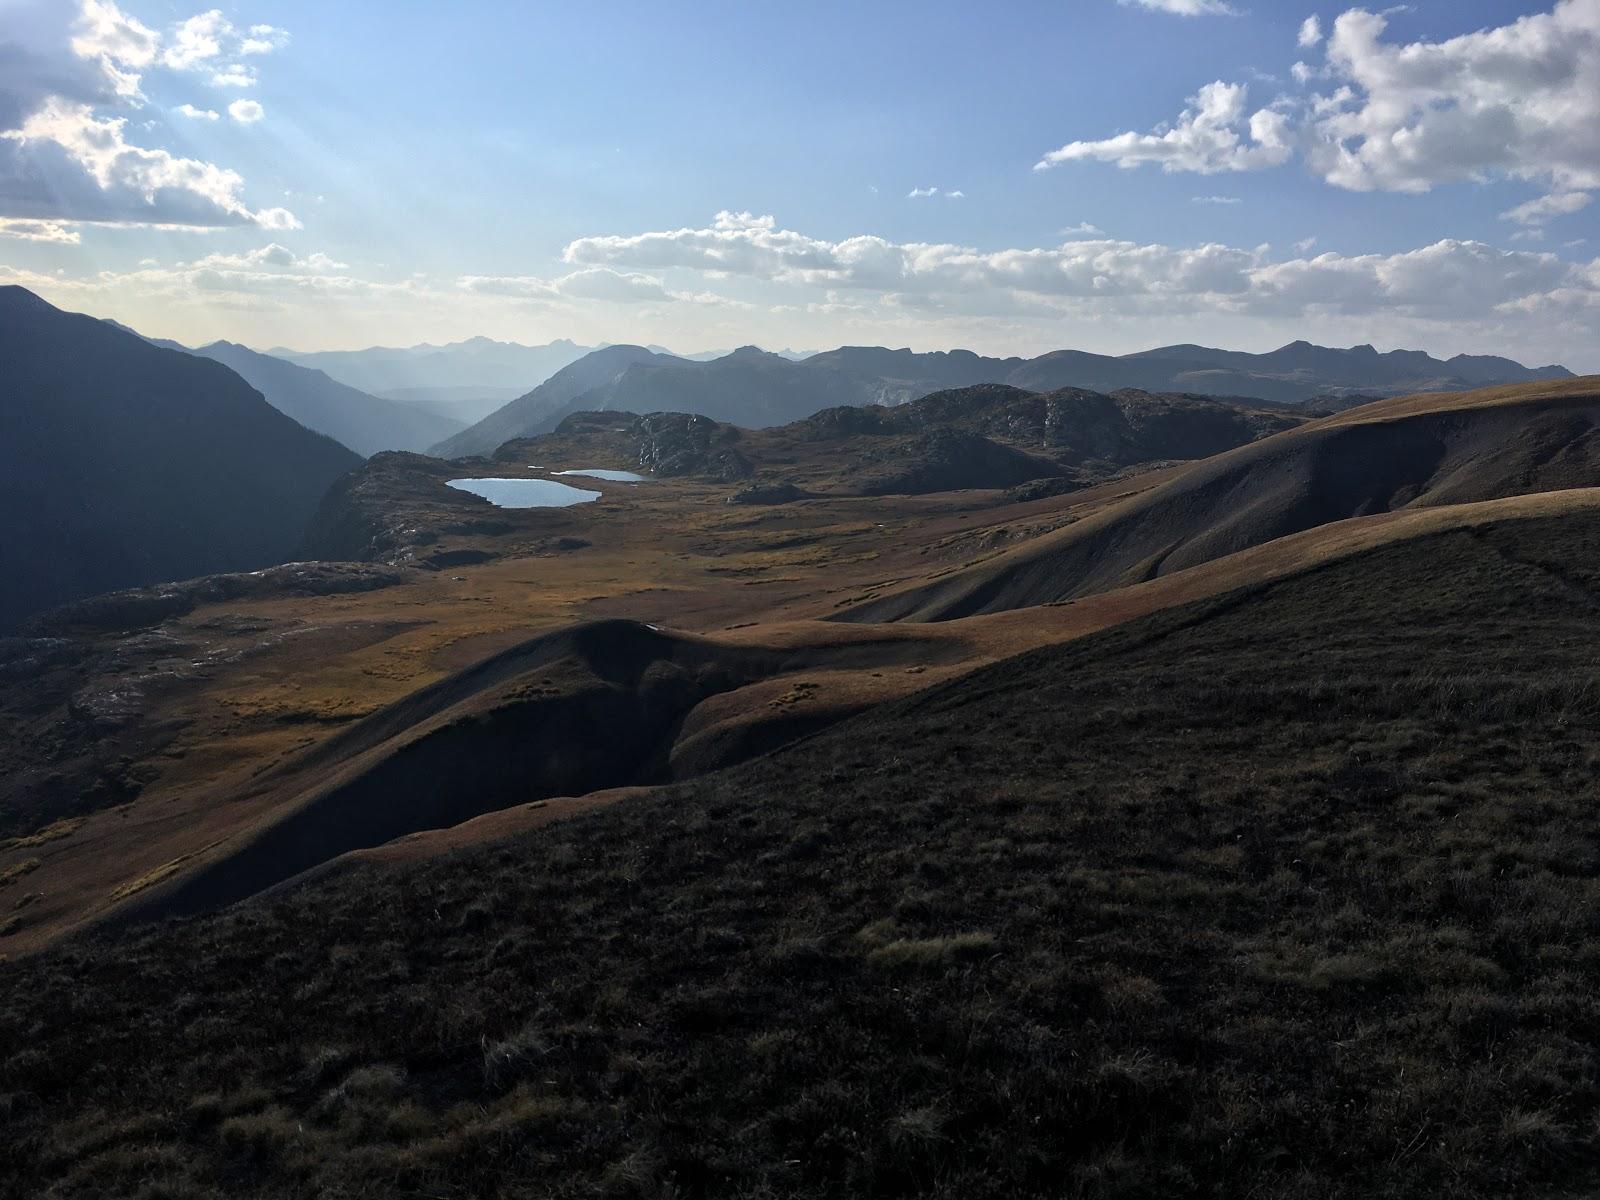 Overlooking the San Juan Mountains.